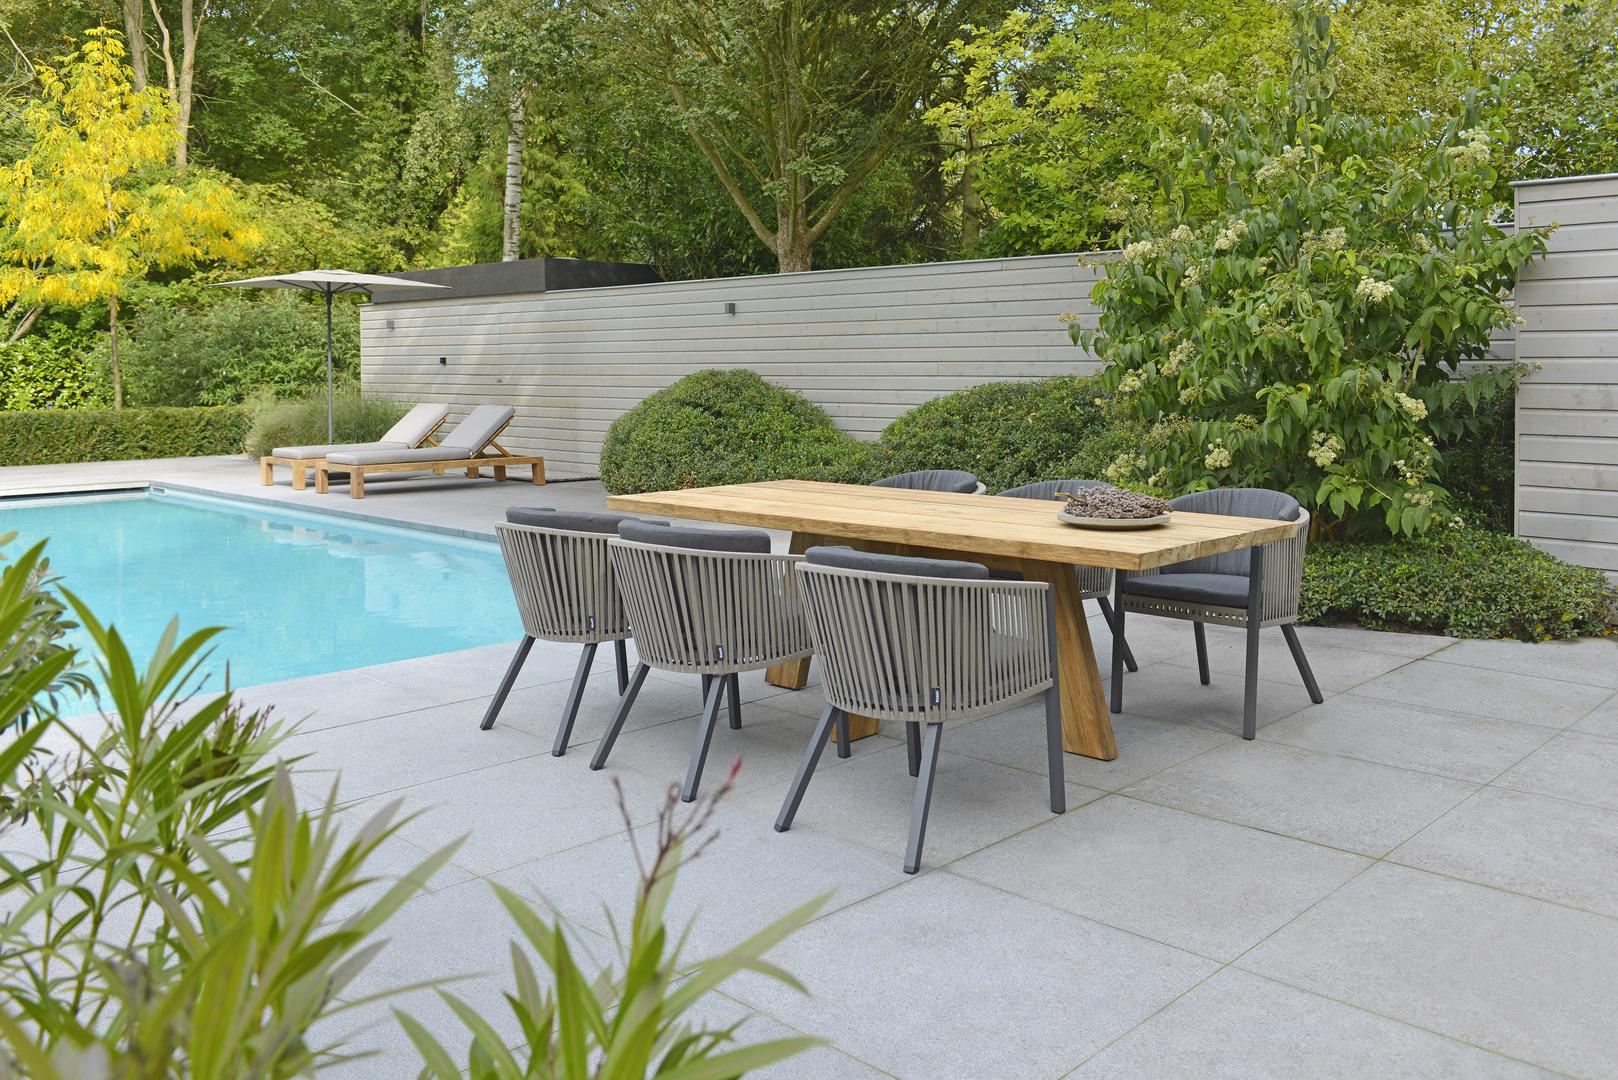 2018 Borek teak Tarifa table Cadiz lounger Studio Borek - belt Cosenza chair Wolterinck - parasol Portimao 2x2.jpg